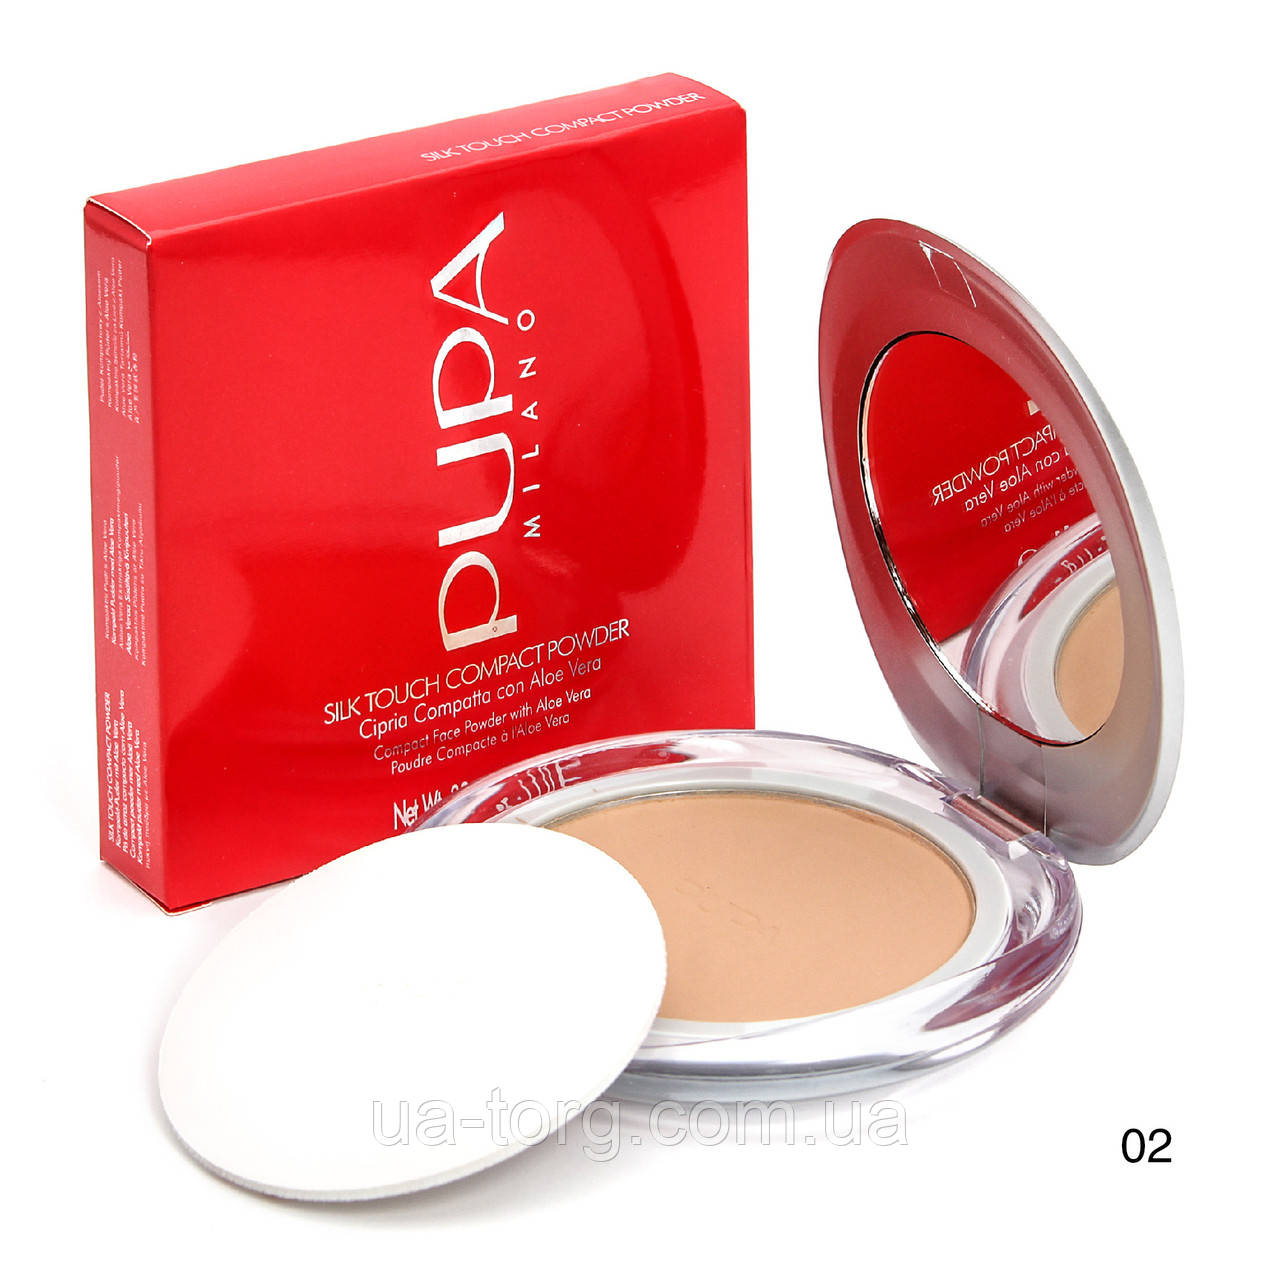 Компaктнaя пудрa Pupa Silk Touch Compact Powder  №2